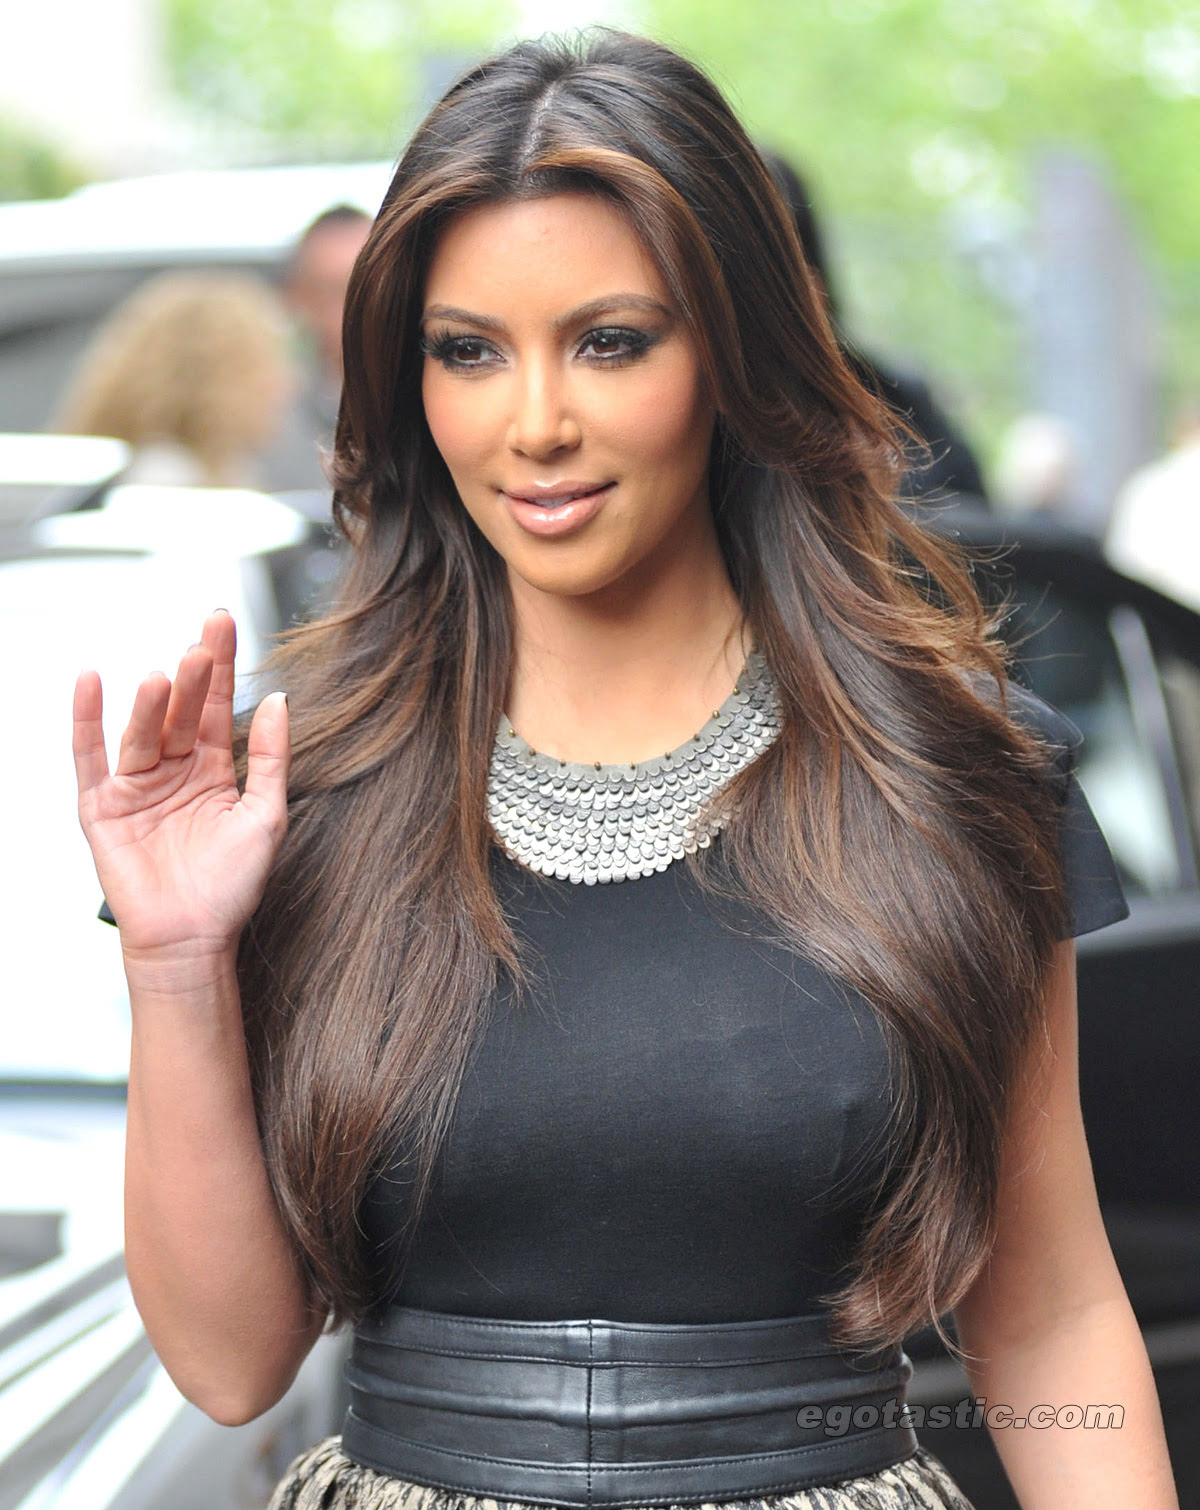 Kim Kardashian incredible cleavage